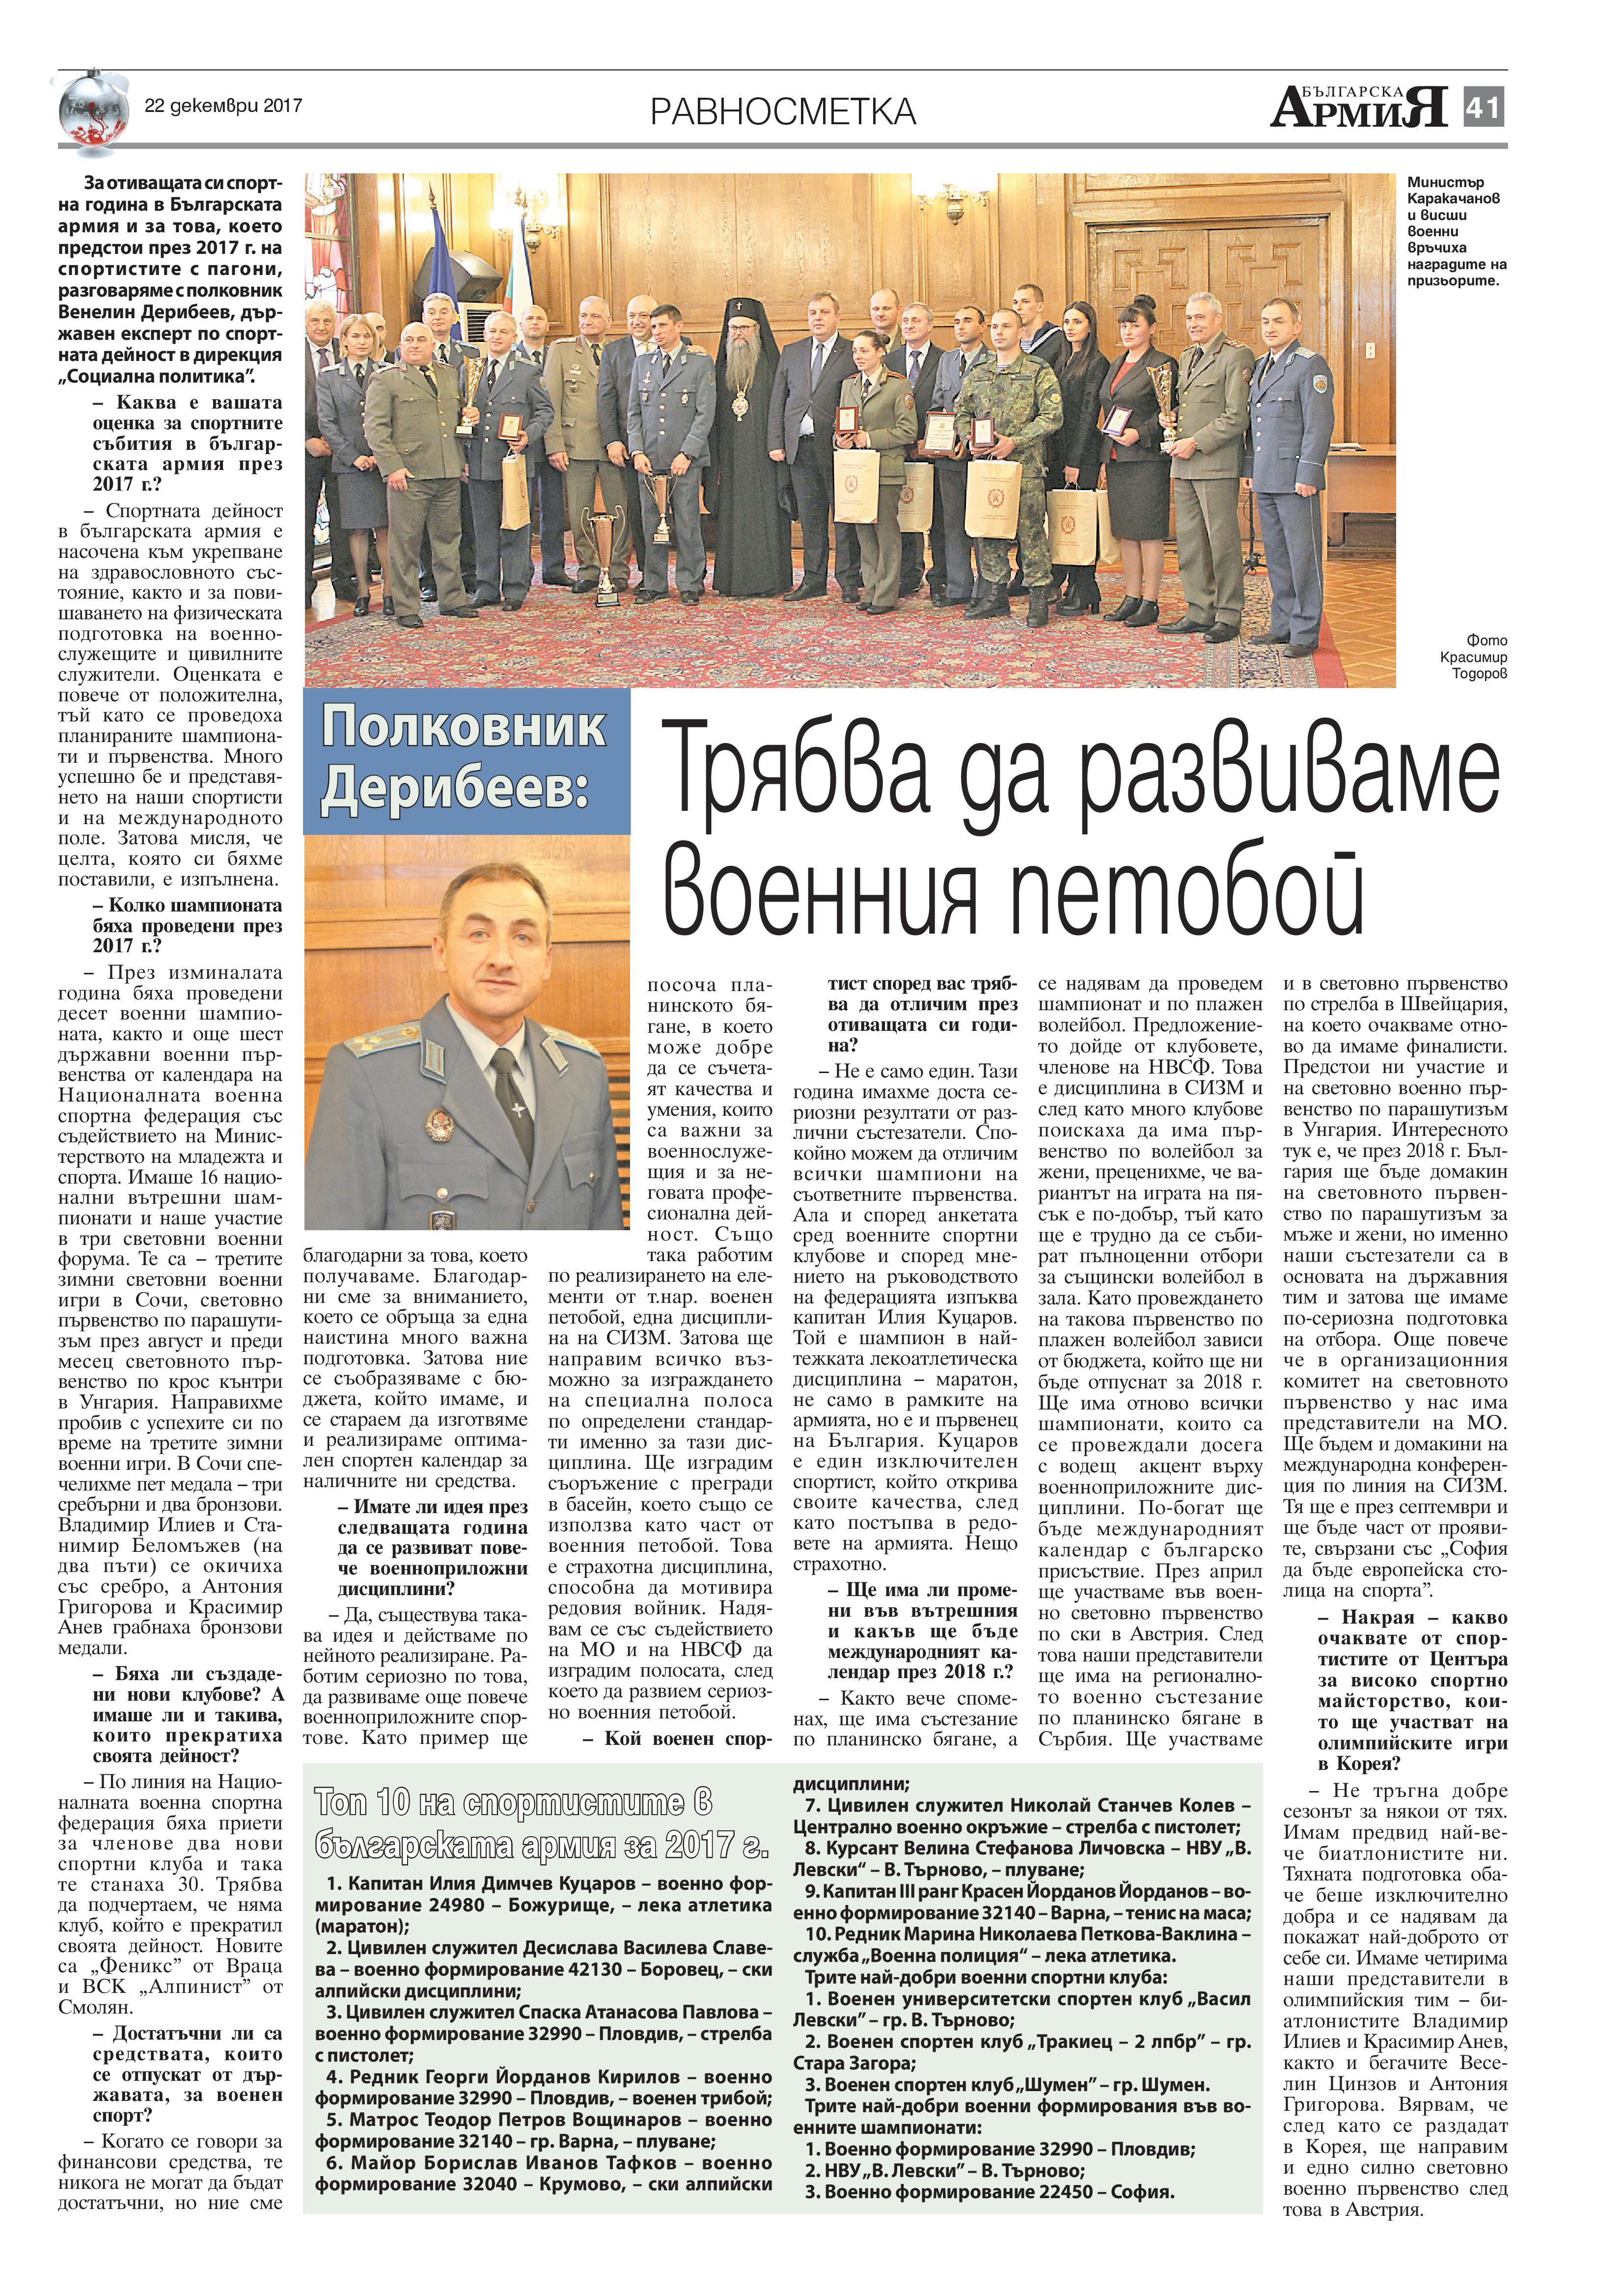 http://armymedia.bg/wp-content/uploads/2015/06/41.jpg